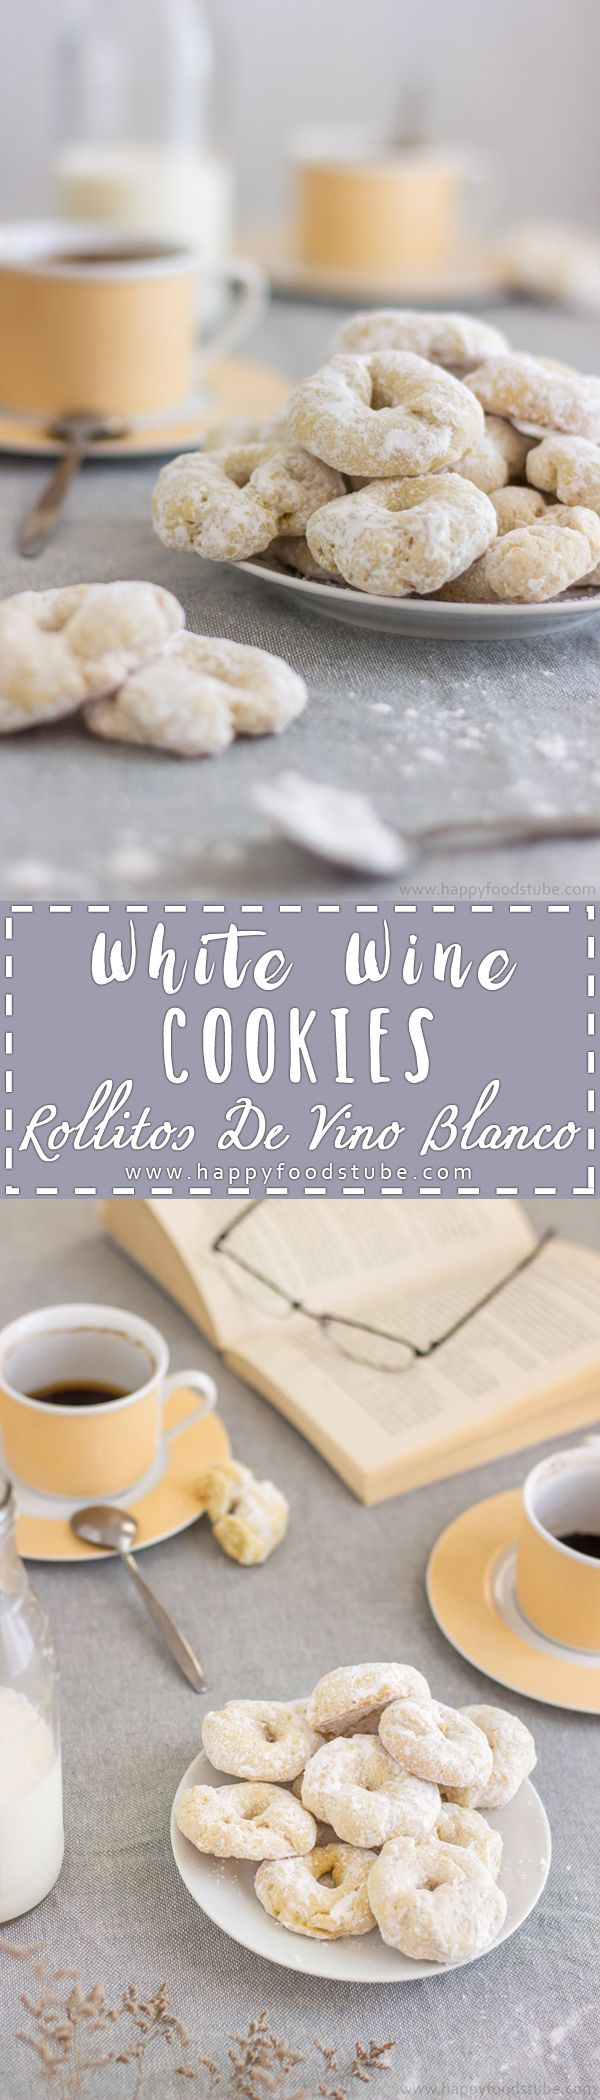 White Wine Cookies – Rollitos de Vino Blanco #spanishmeals